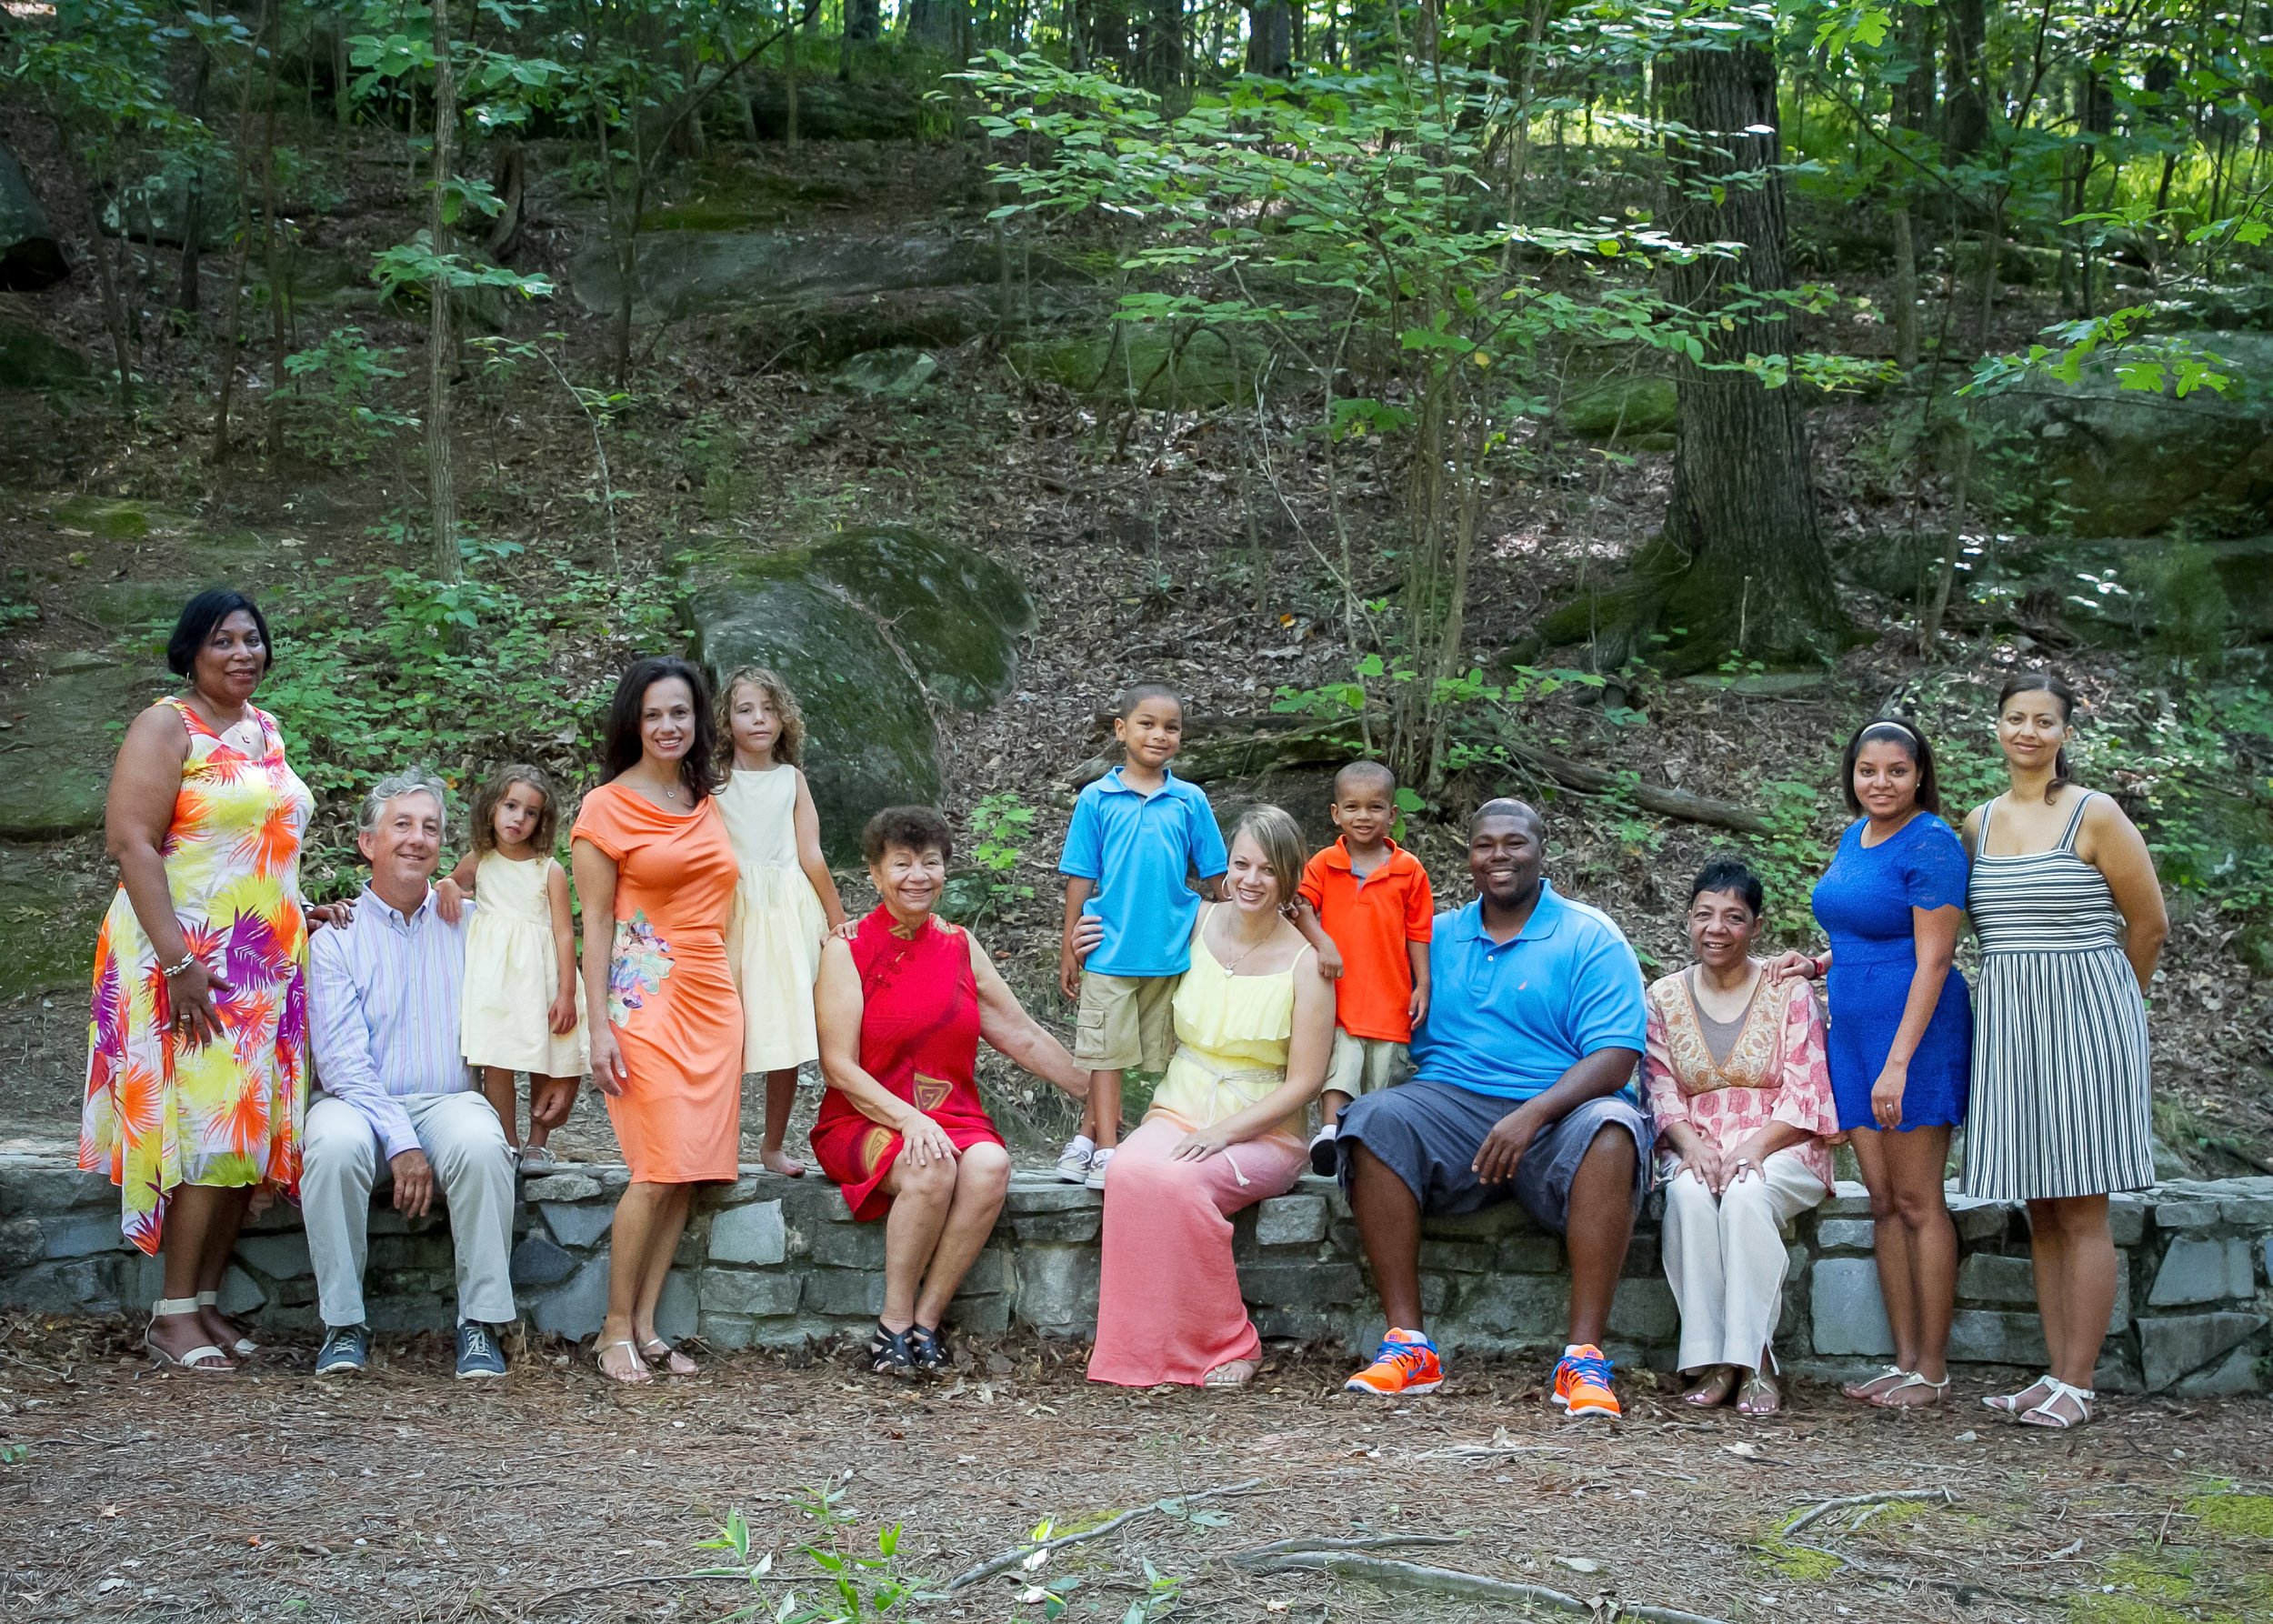 Family Portrait at Stone Mountain Park